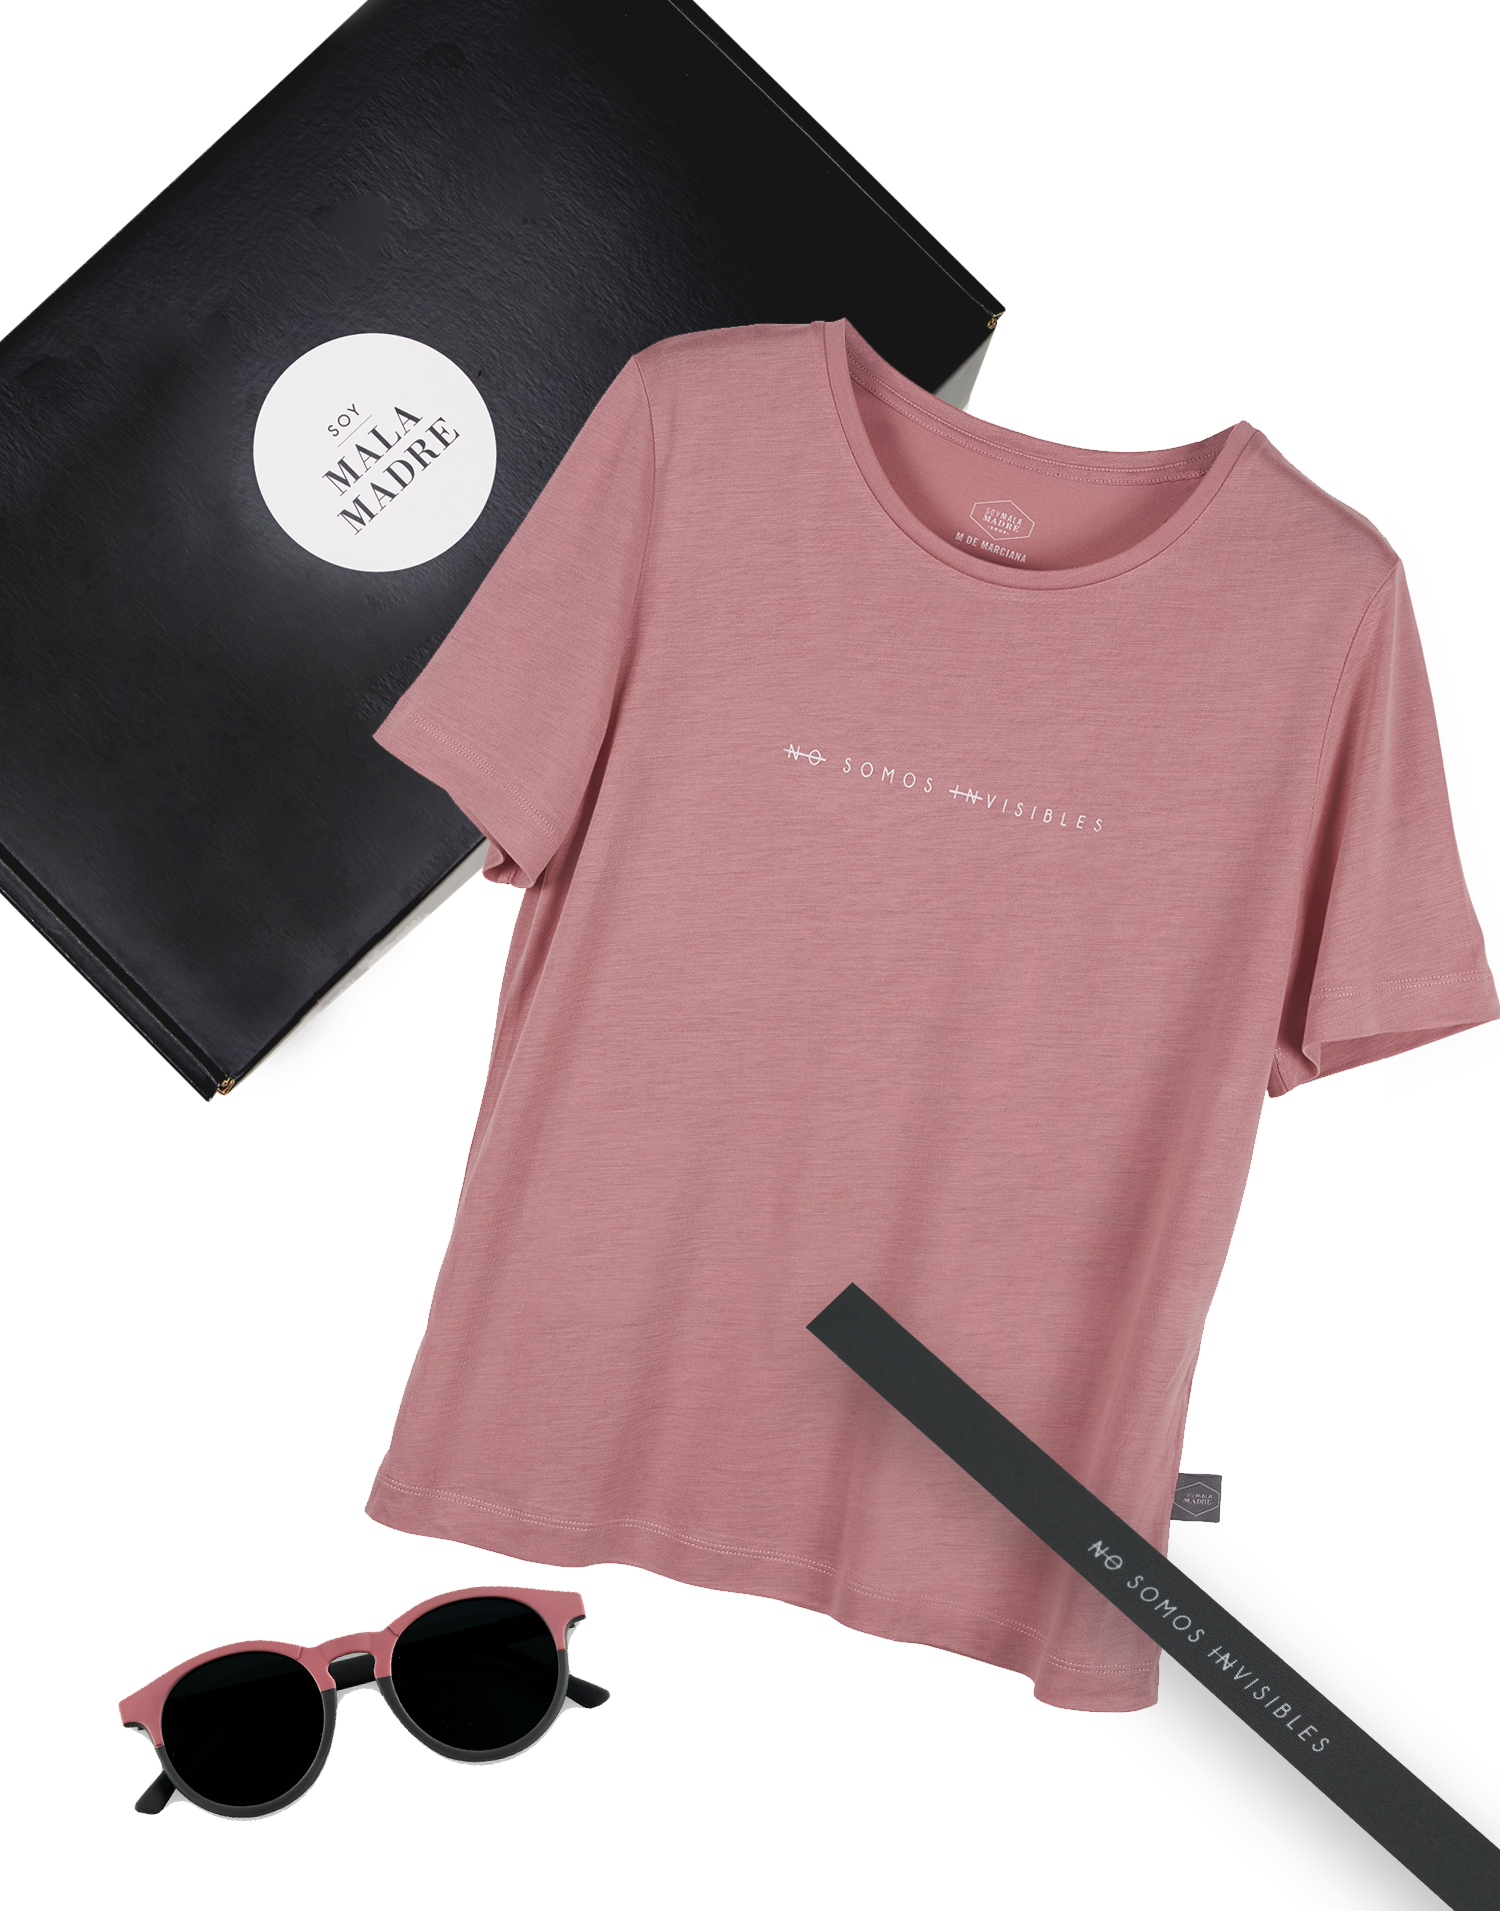 kit-regalo-invisibles-rosa